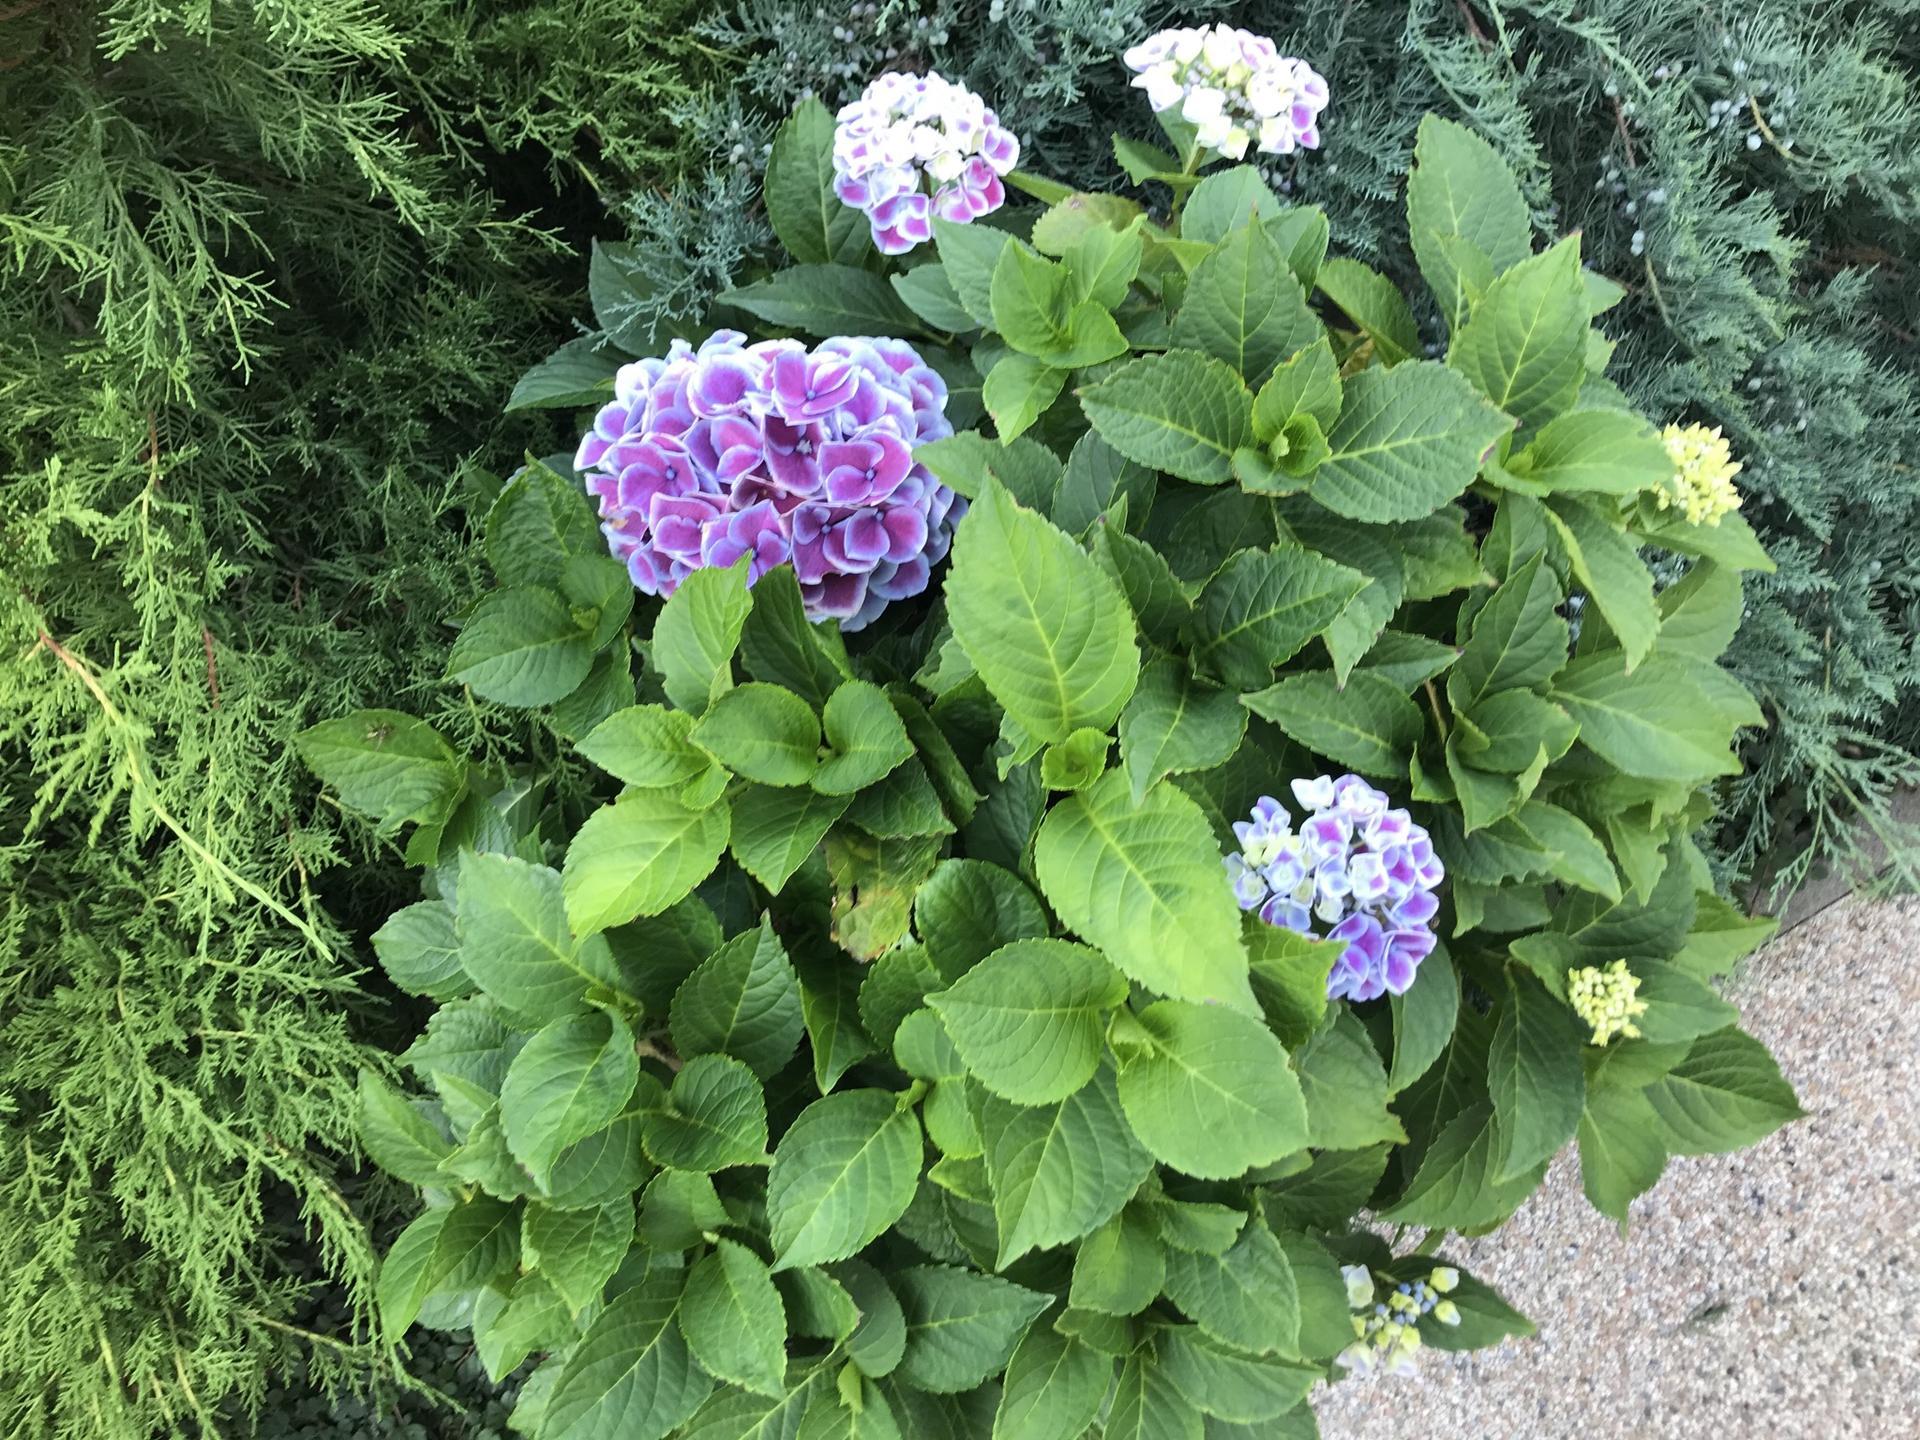 Naša záhradka 2020 - Obrázek č. 77